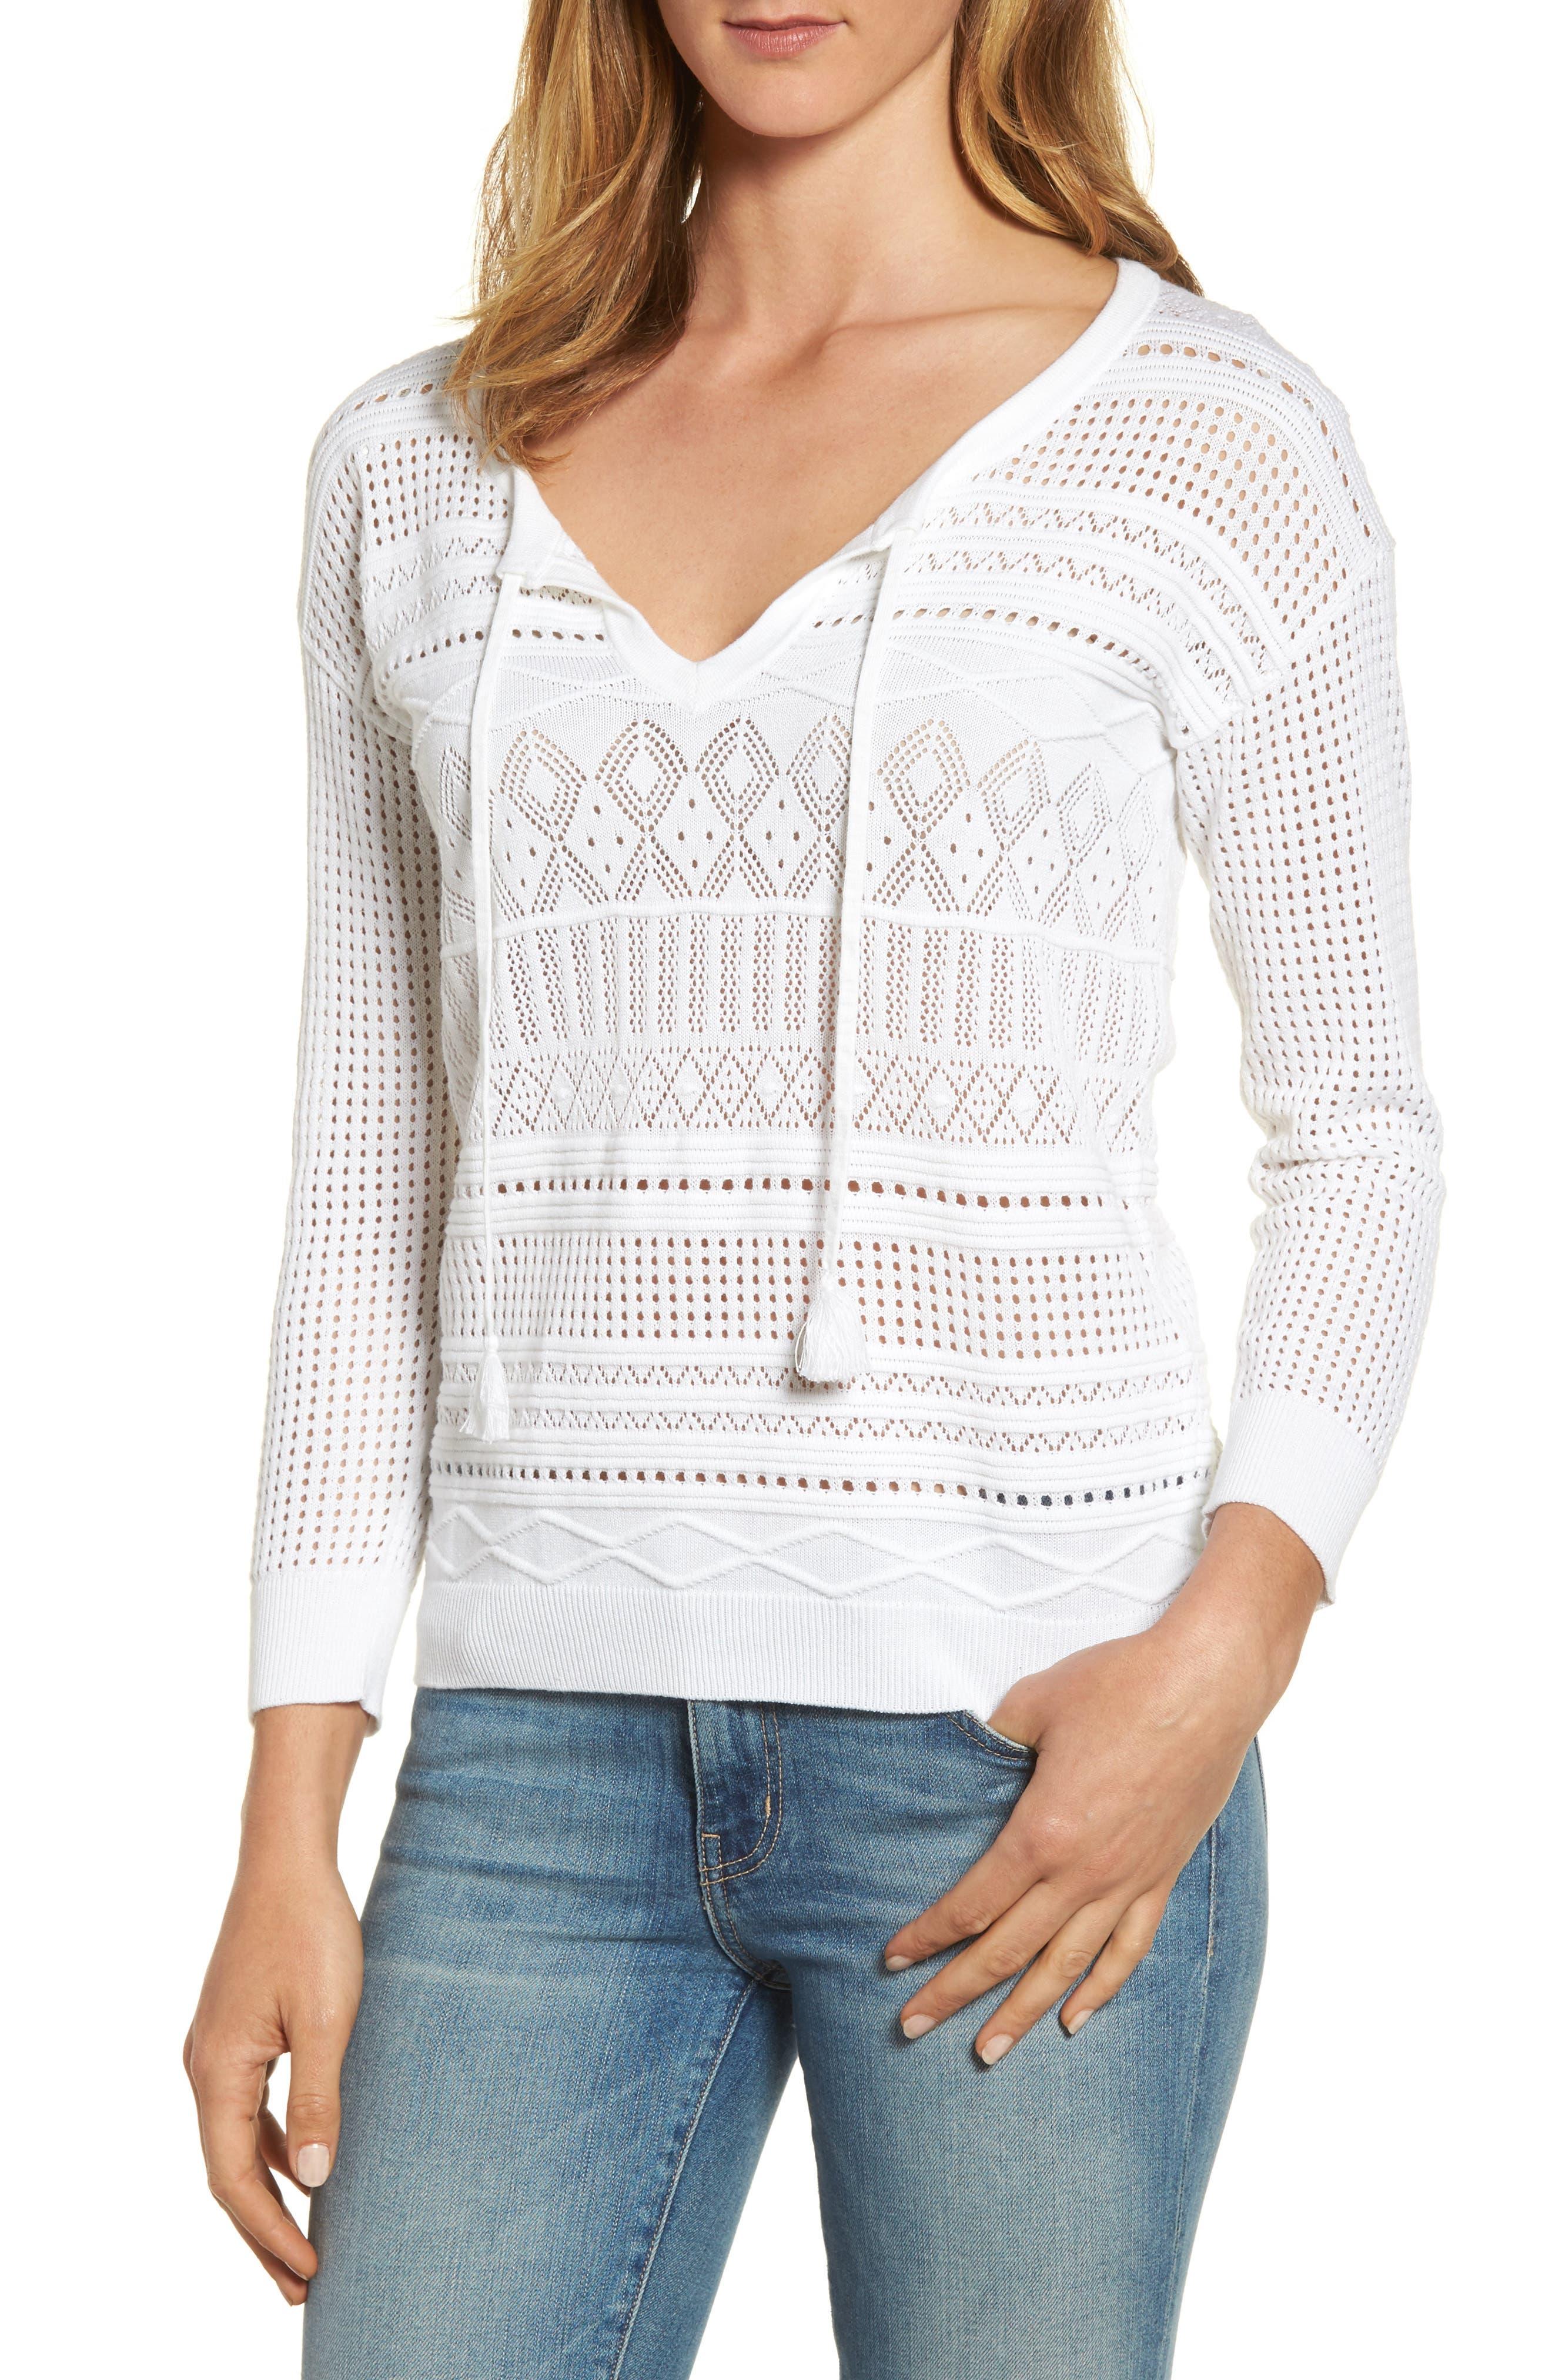 Pickford Pointelle Split Neck Sweater,                             Main thumbnail 1, color,                             100